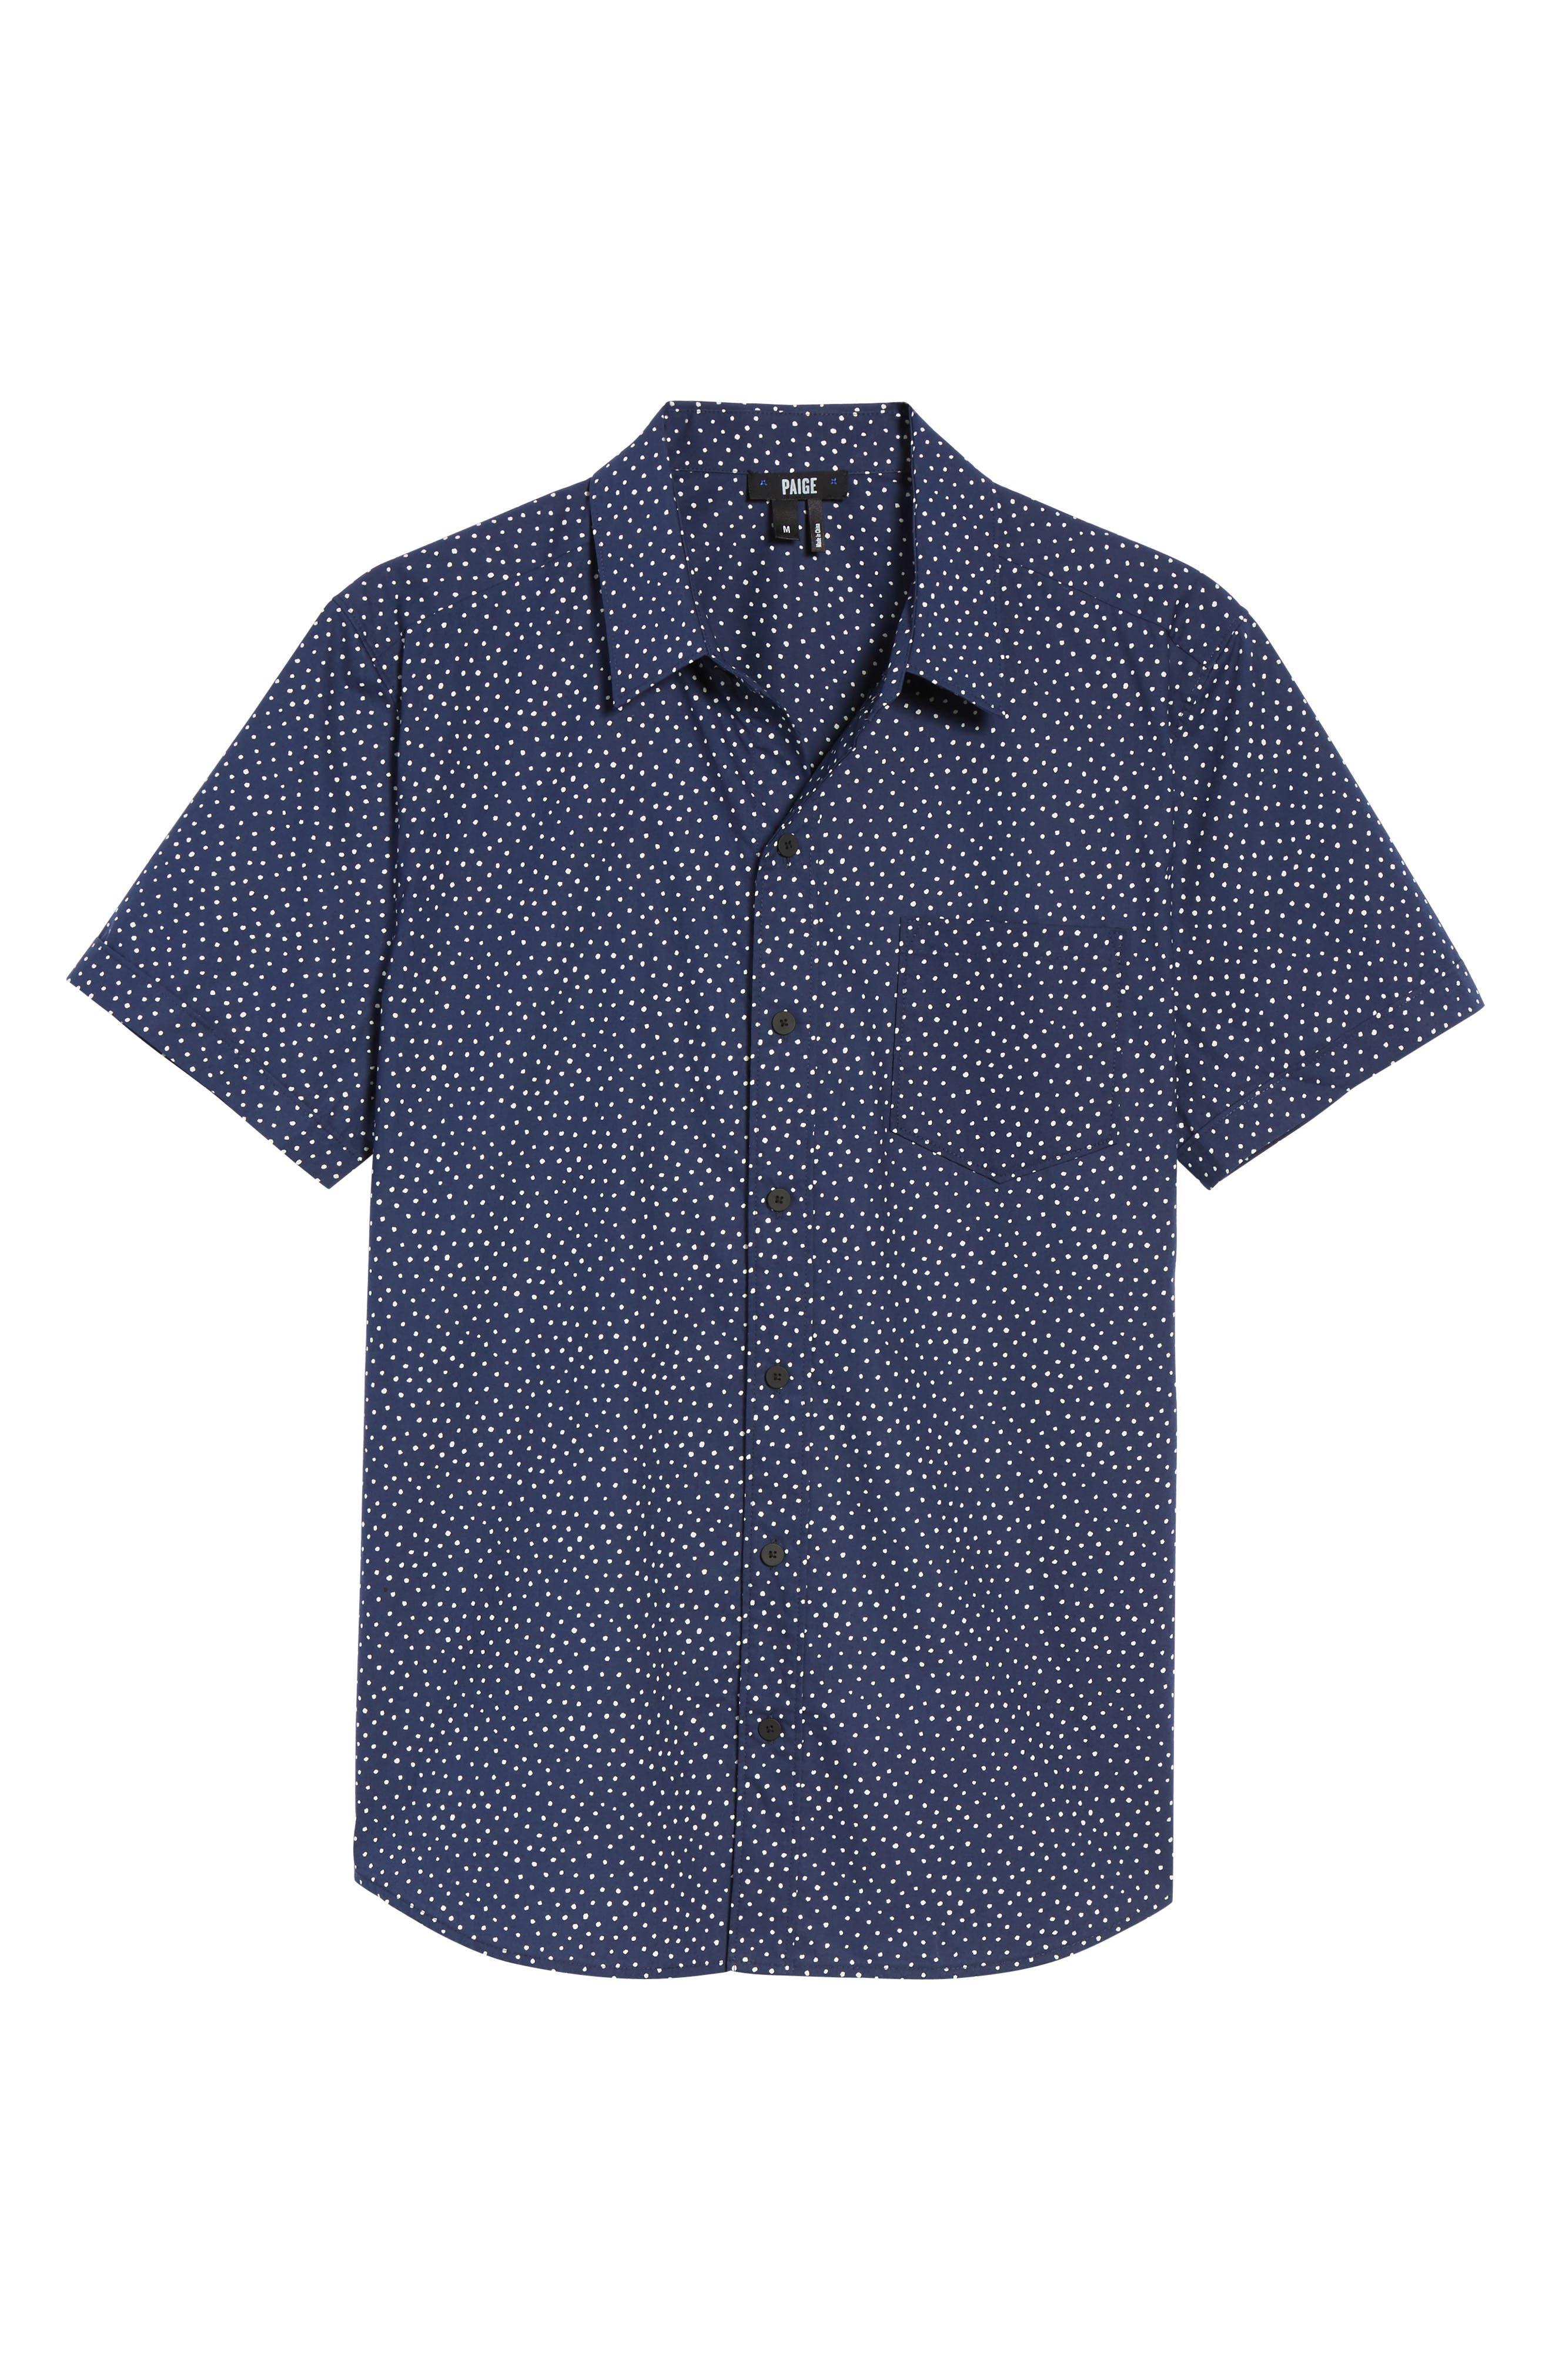 Becker Dot Print Woven Shirt,                             Alternate thumbnail 12, color,